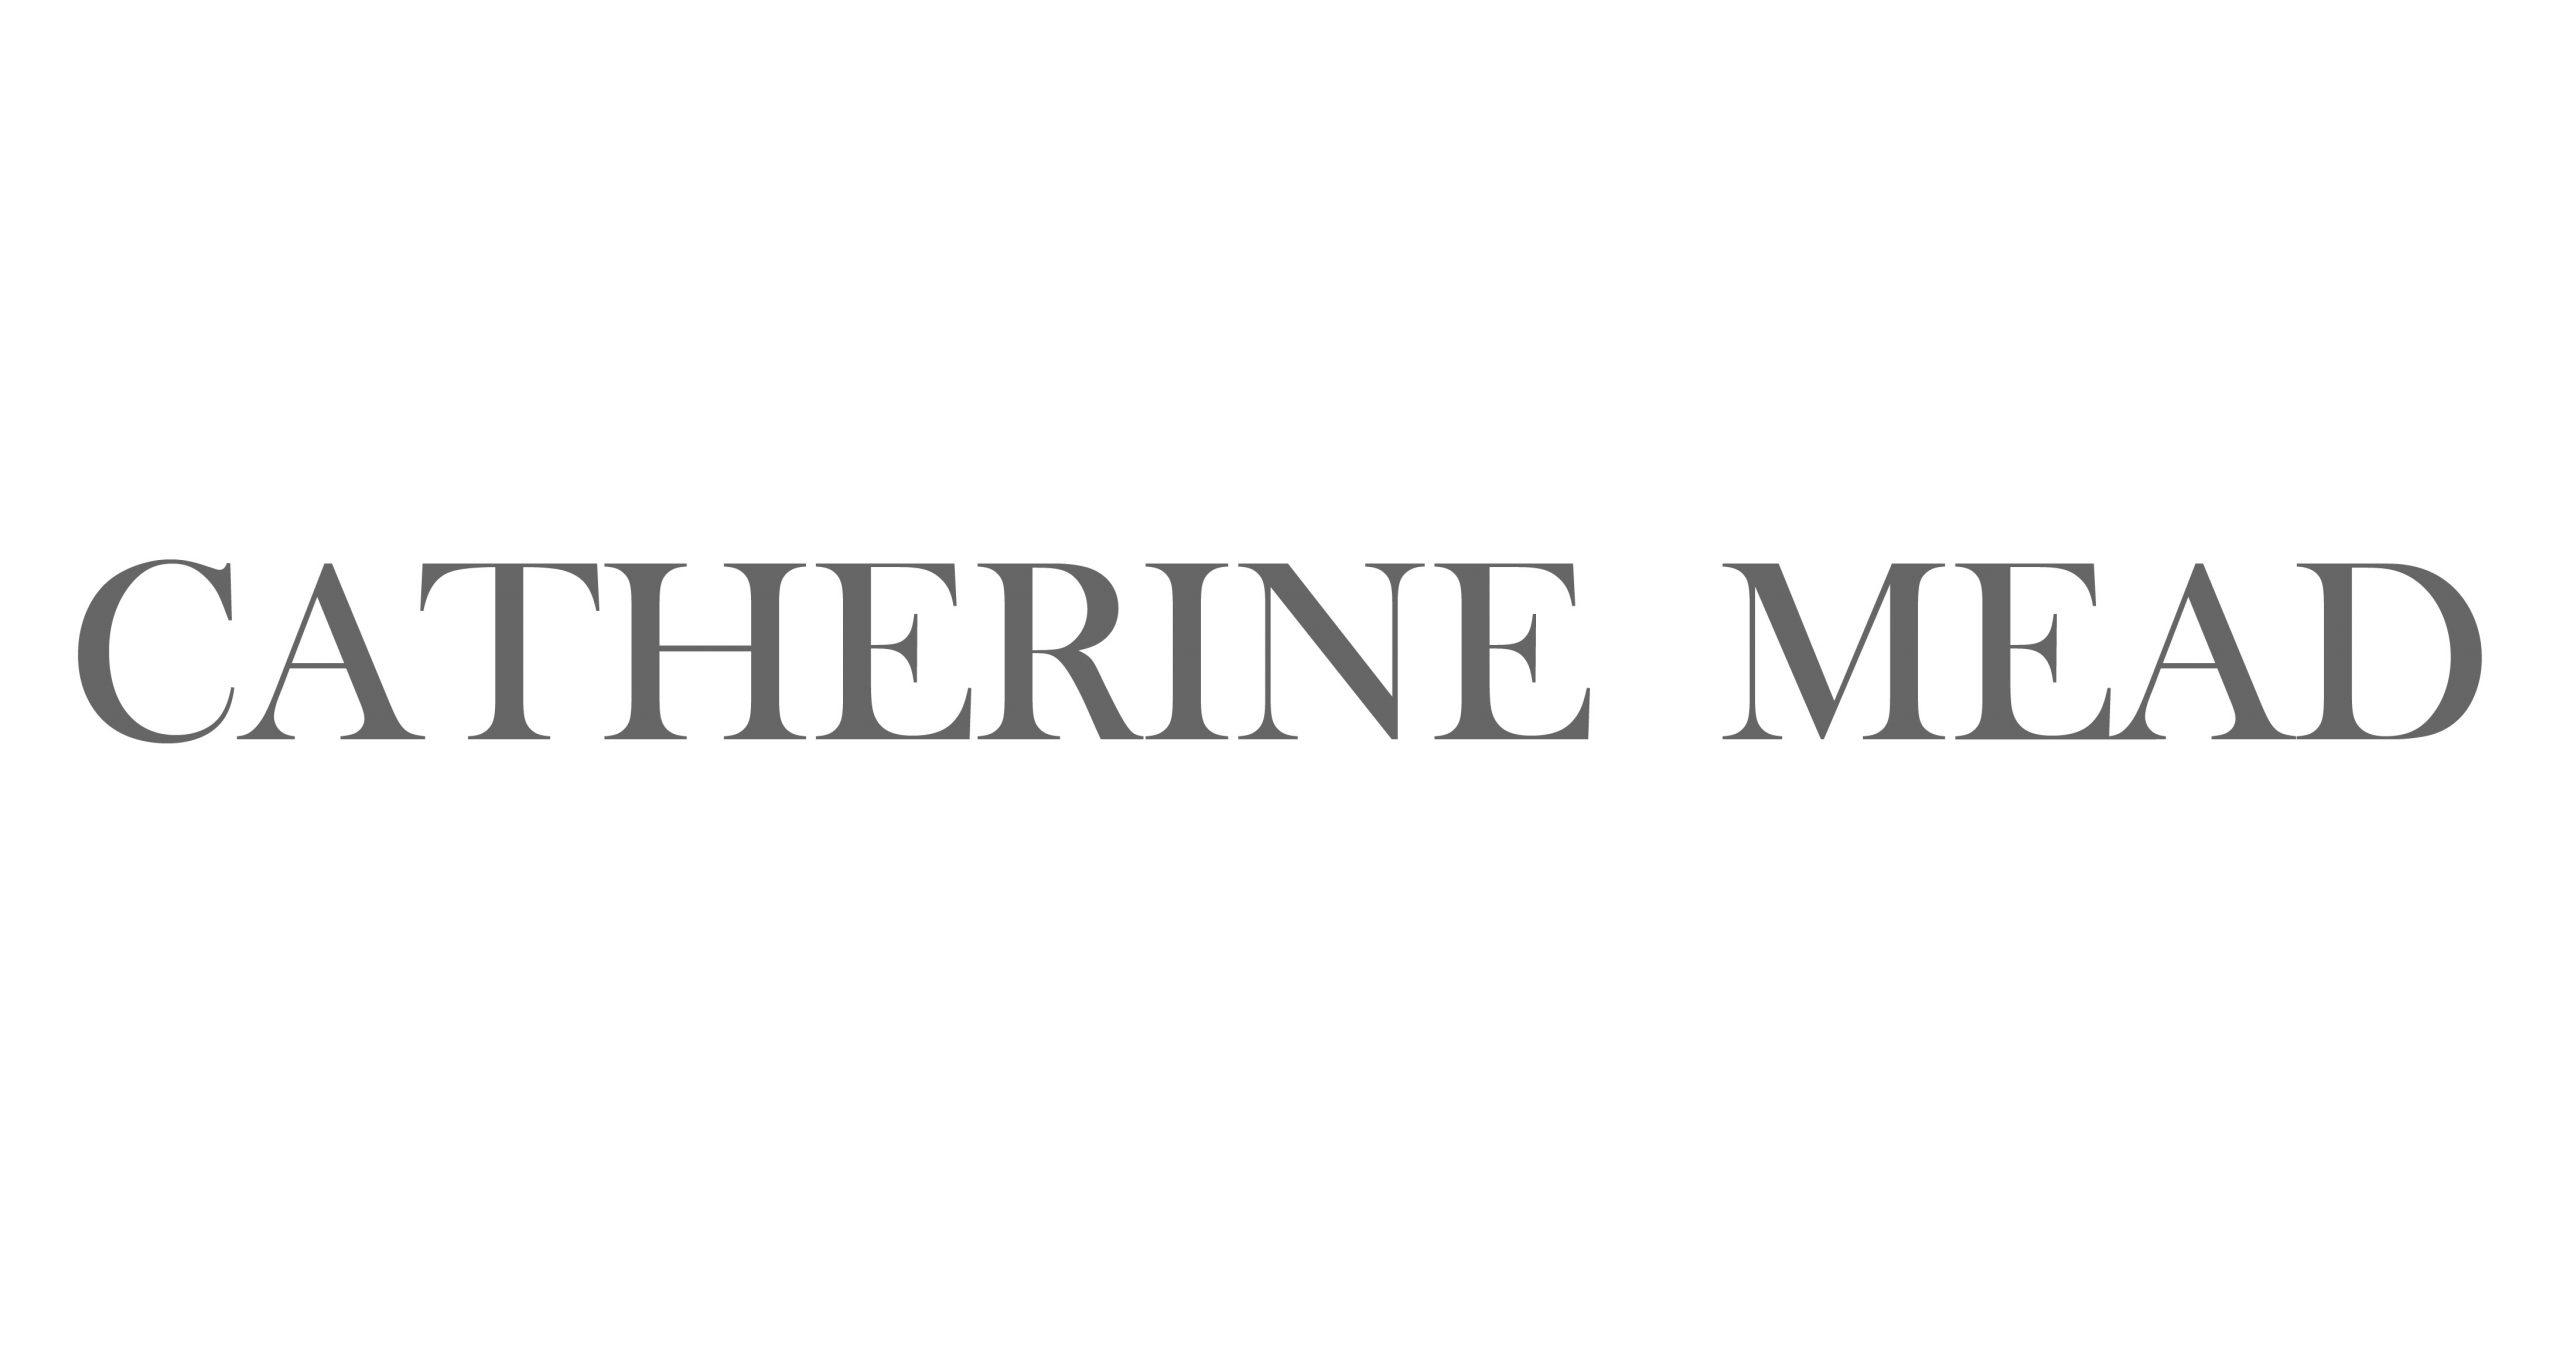 Catherine Mead